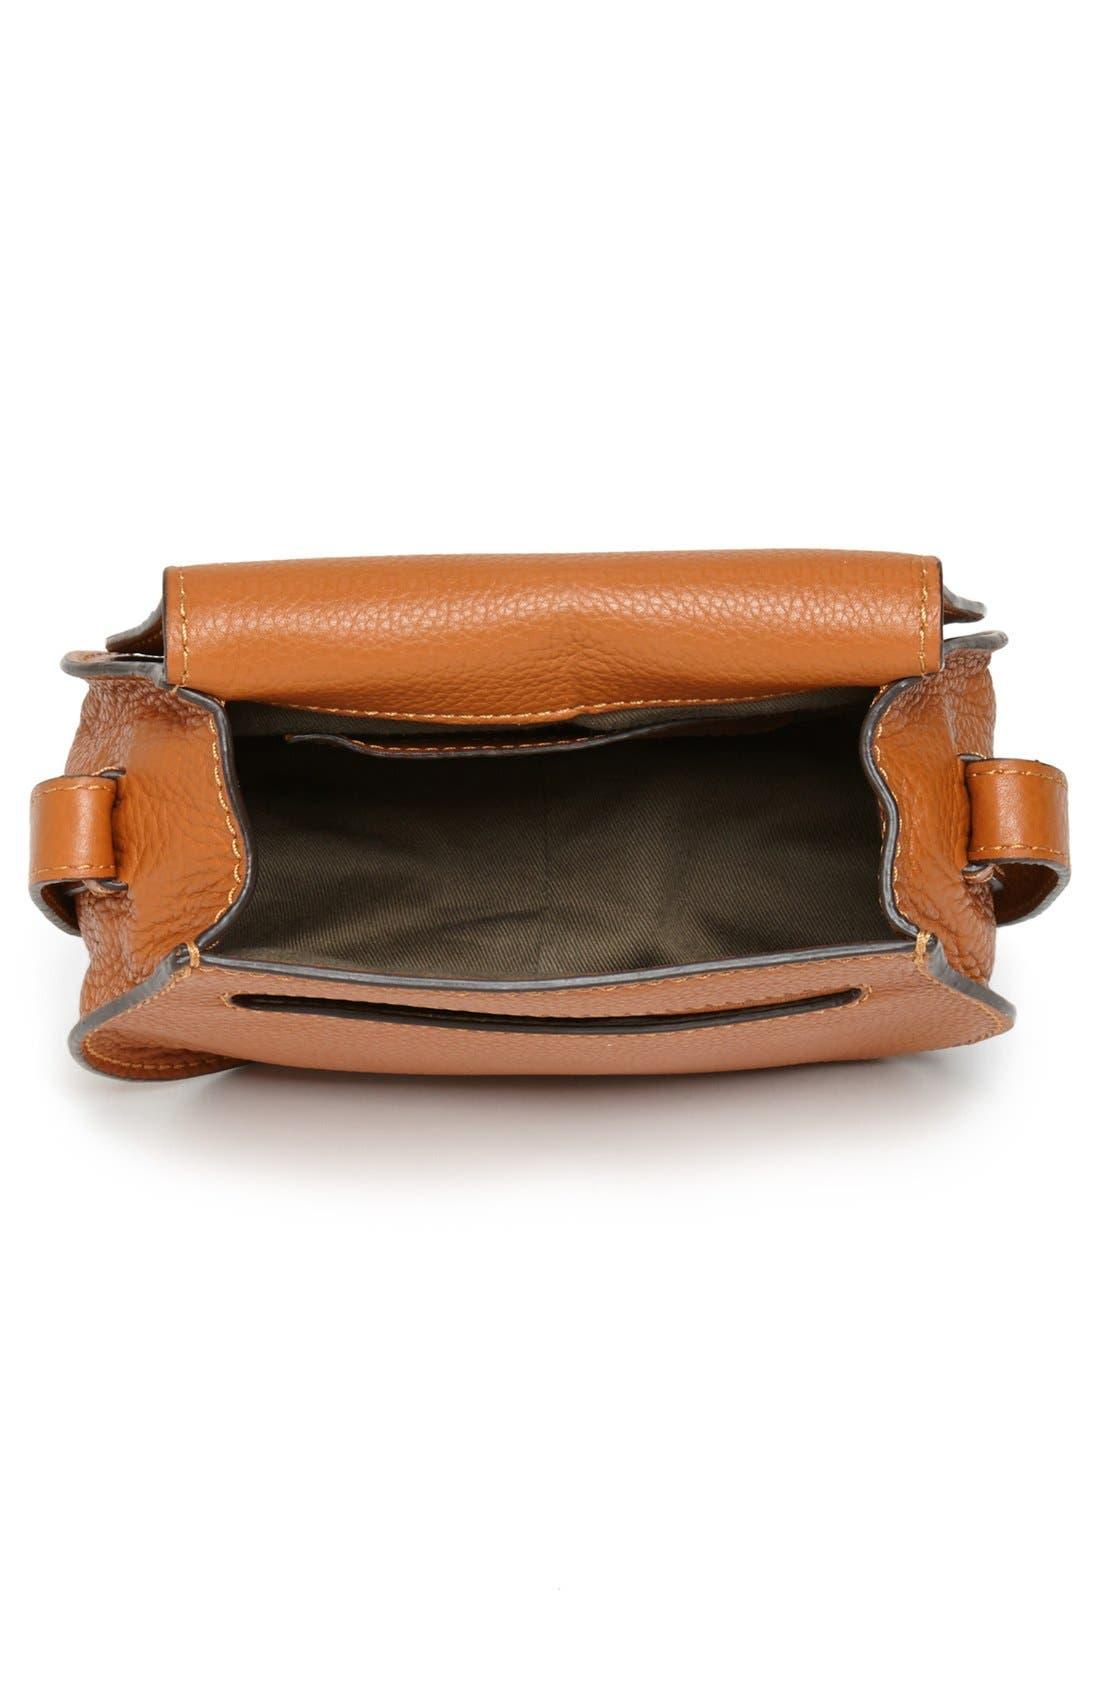 CHLOÉ, 'Mini Marcie' Leather Crossbody Bag, Alternate thumbnail 4, color, TAN GOLD HRDWRE